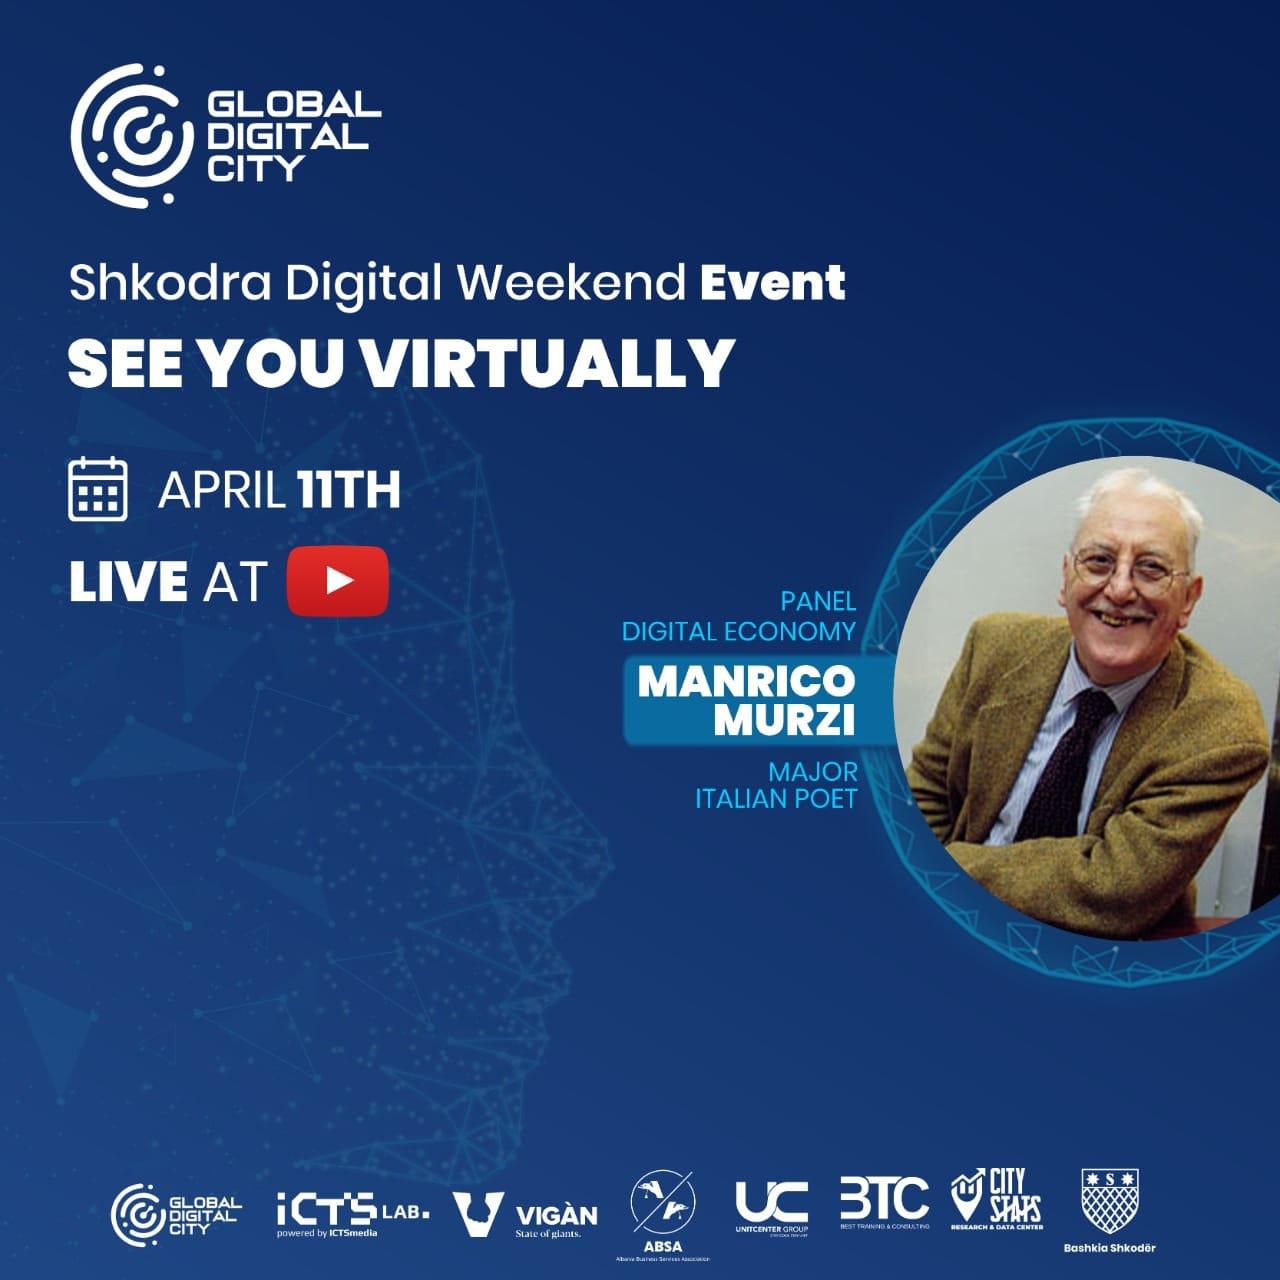 Manrico Murzi Italian Poet Global Digital City